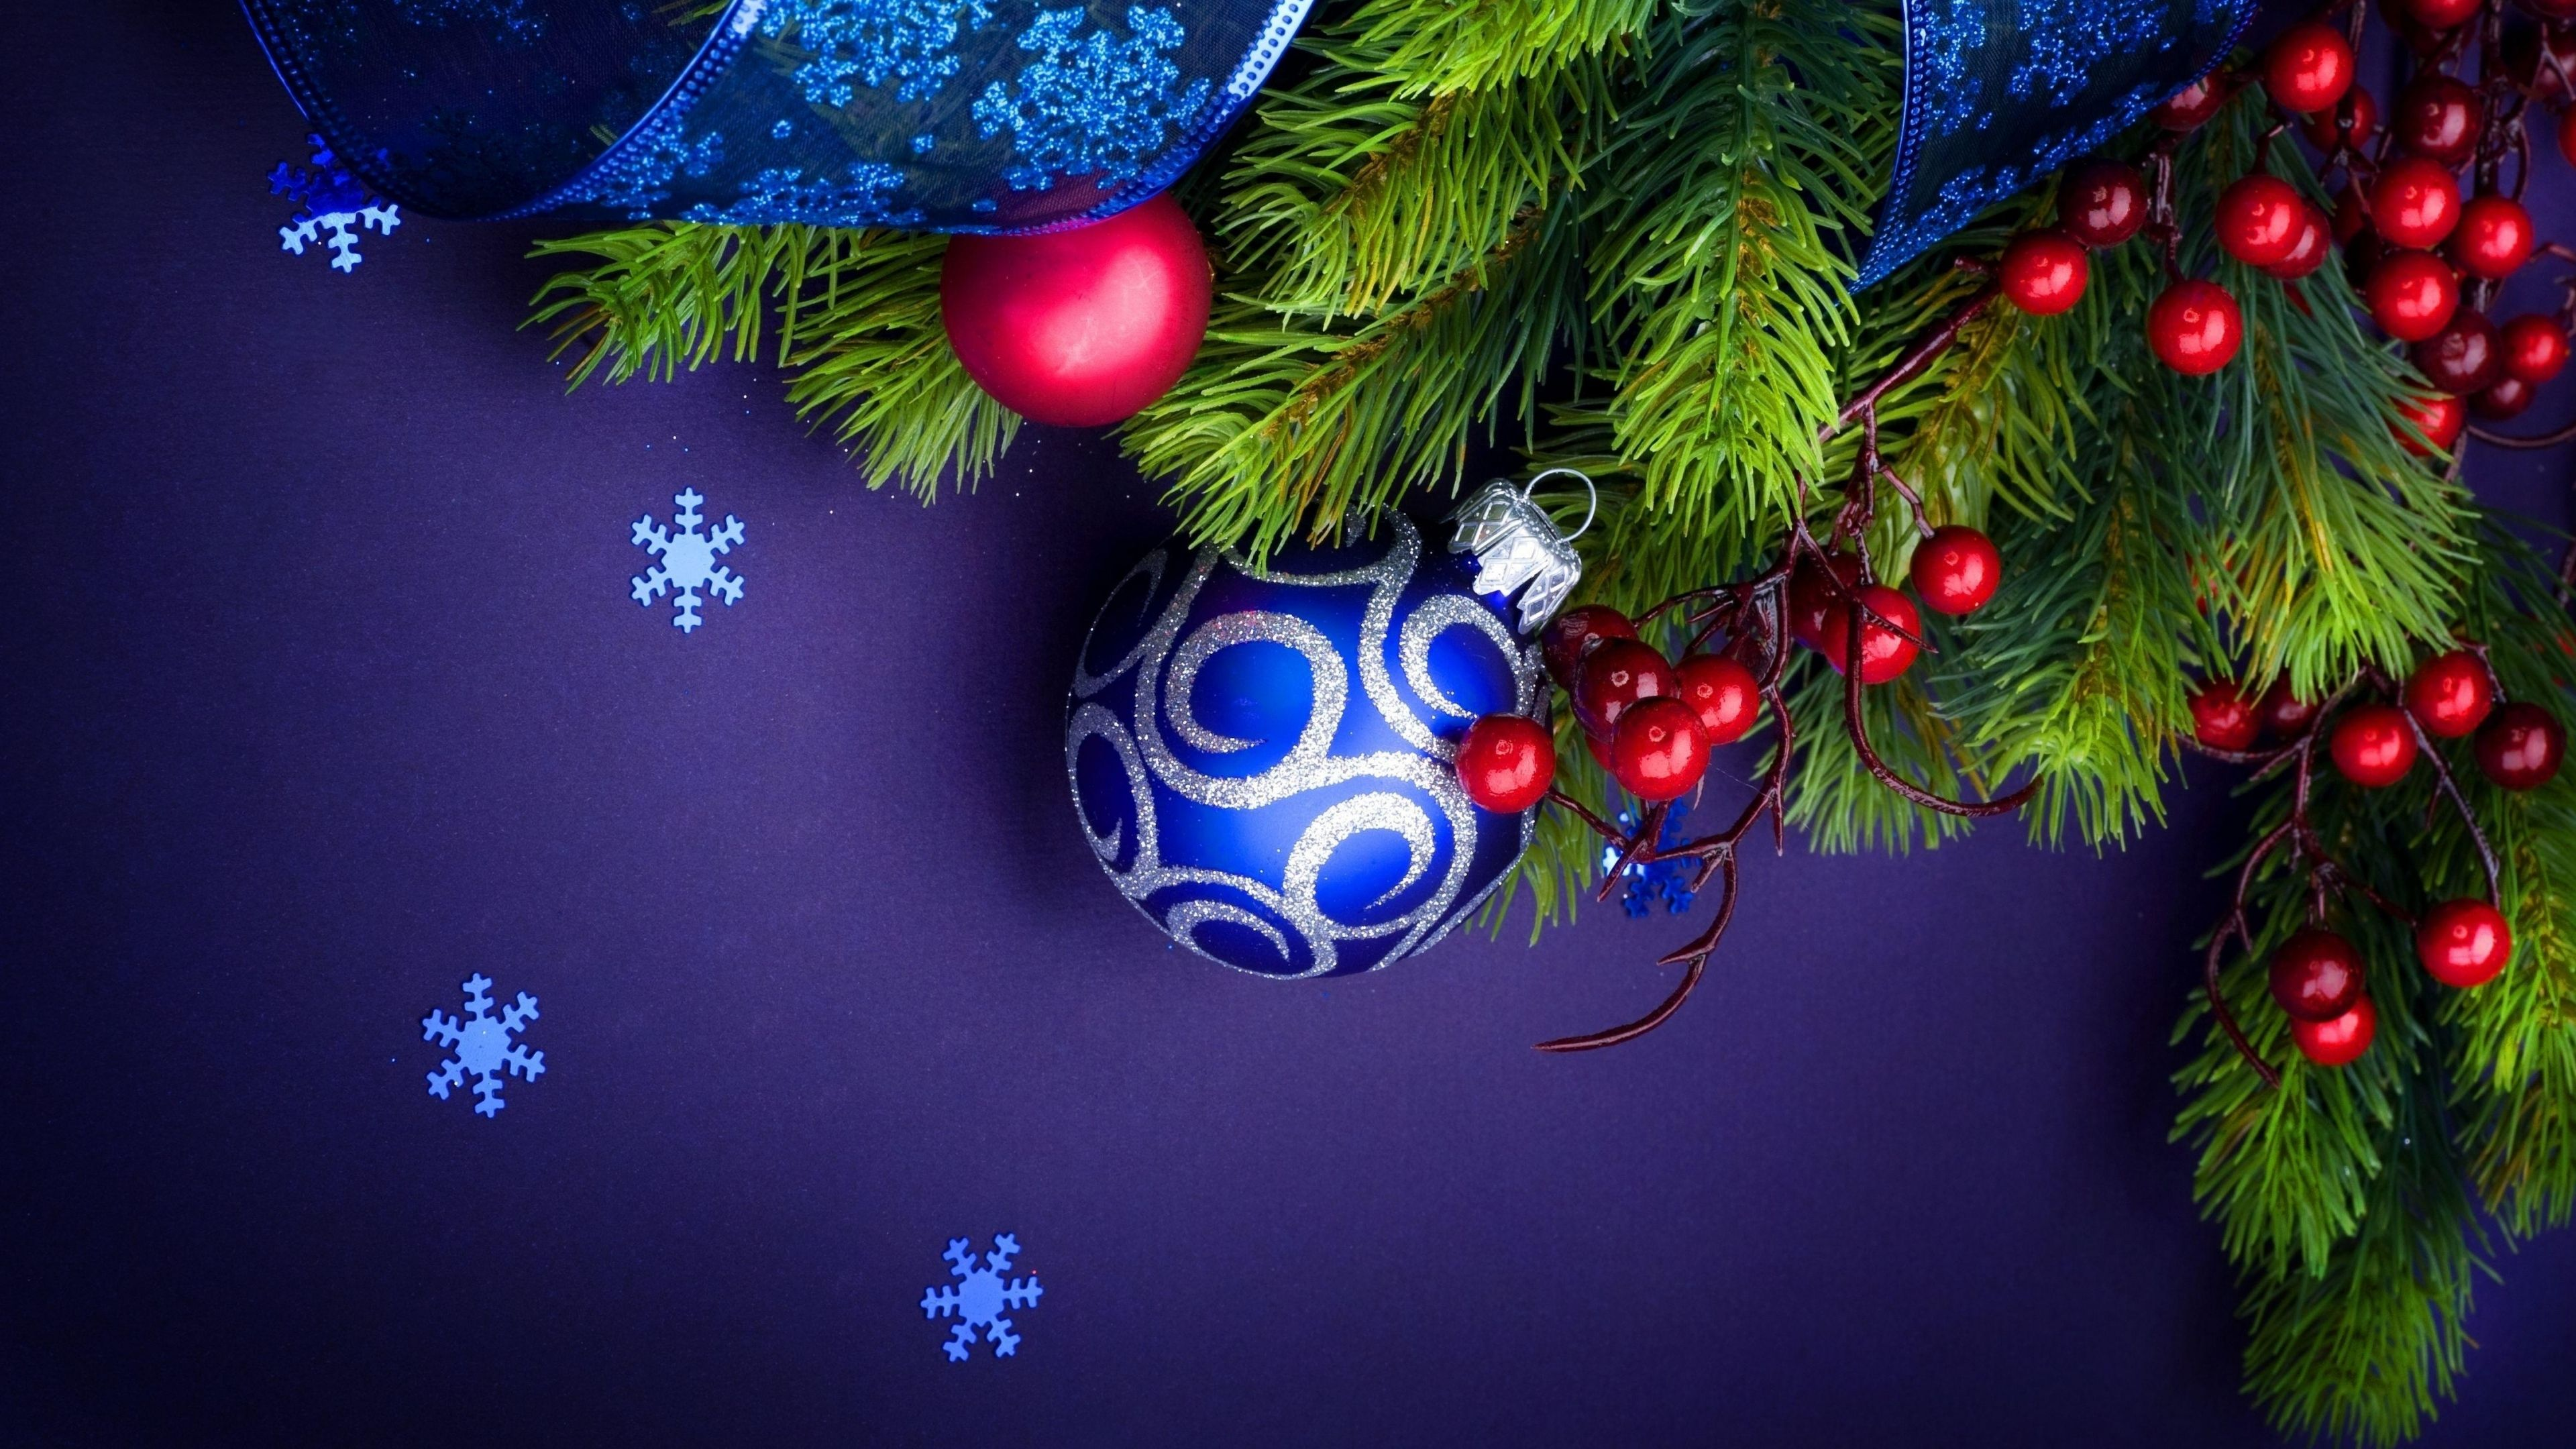 3840x2160 Wallpaper Needles Thread Christmas Decorations Snowflakes Ribbon New Year Merry Christmas Wallpaper Christmas Wallpaper Christmas Wallpaper Hd